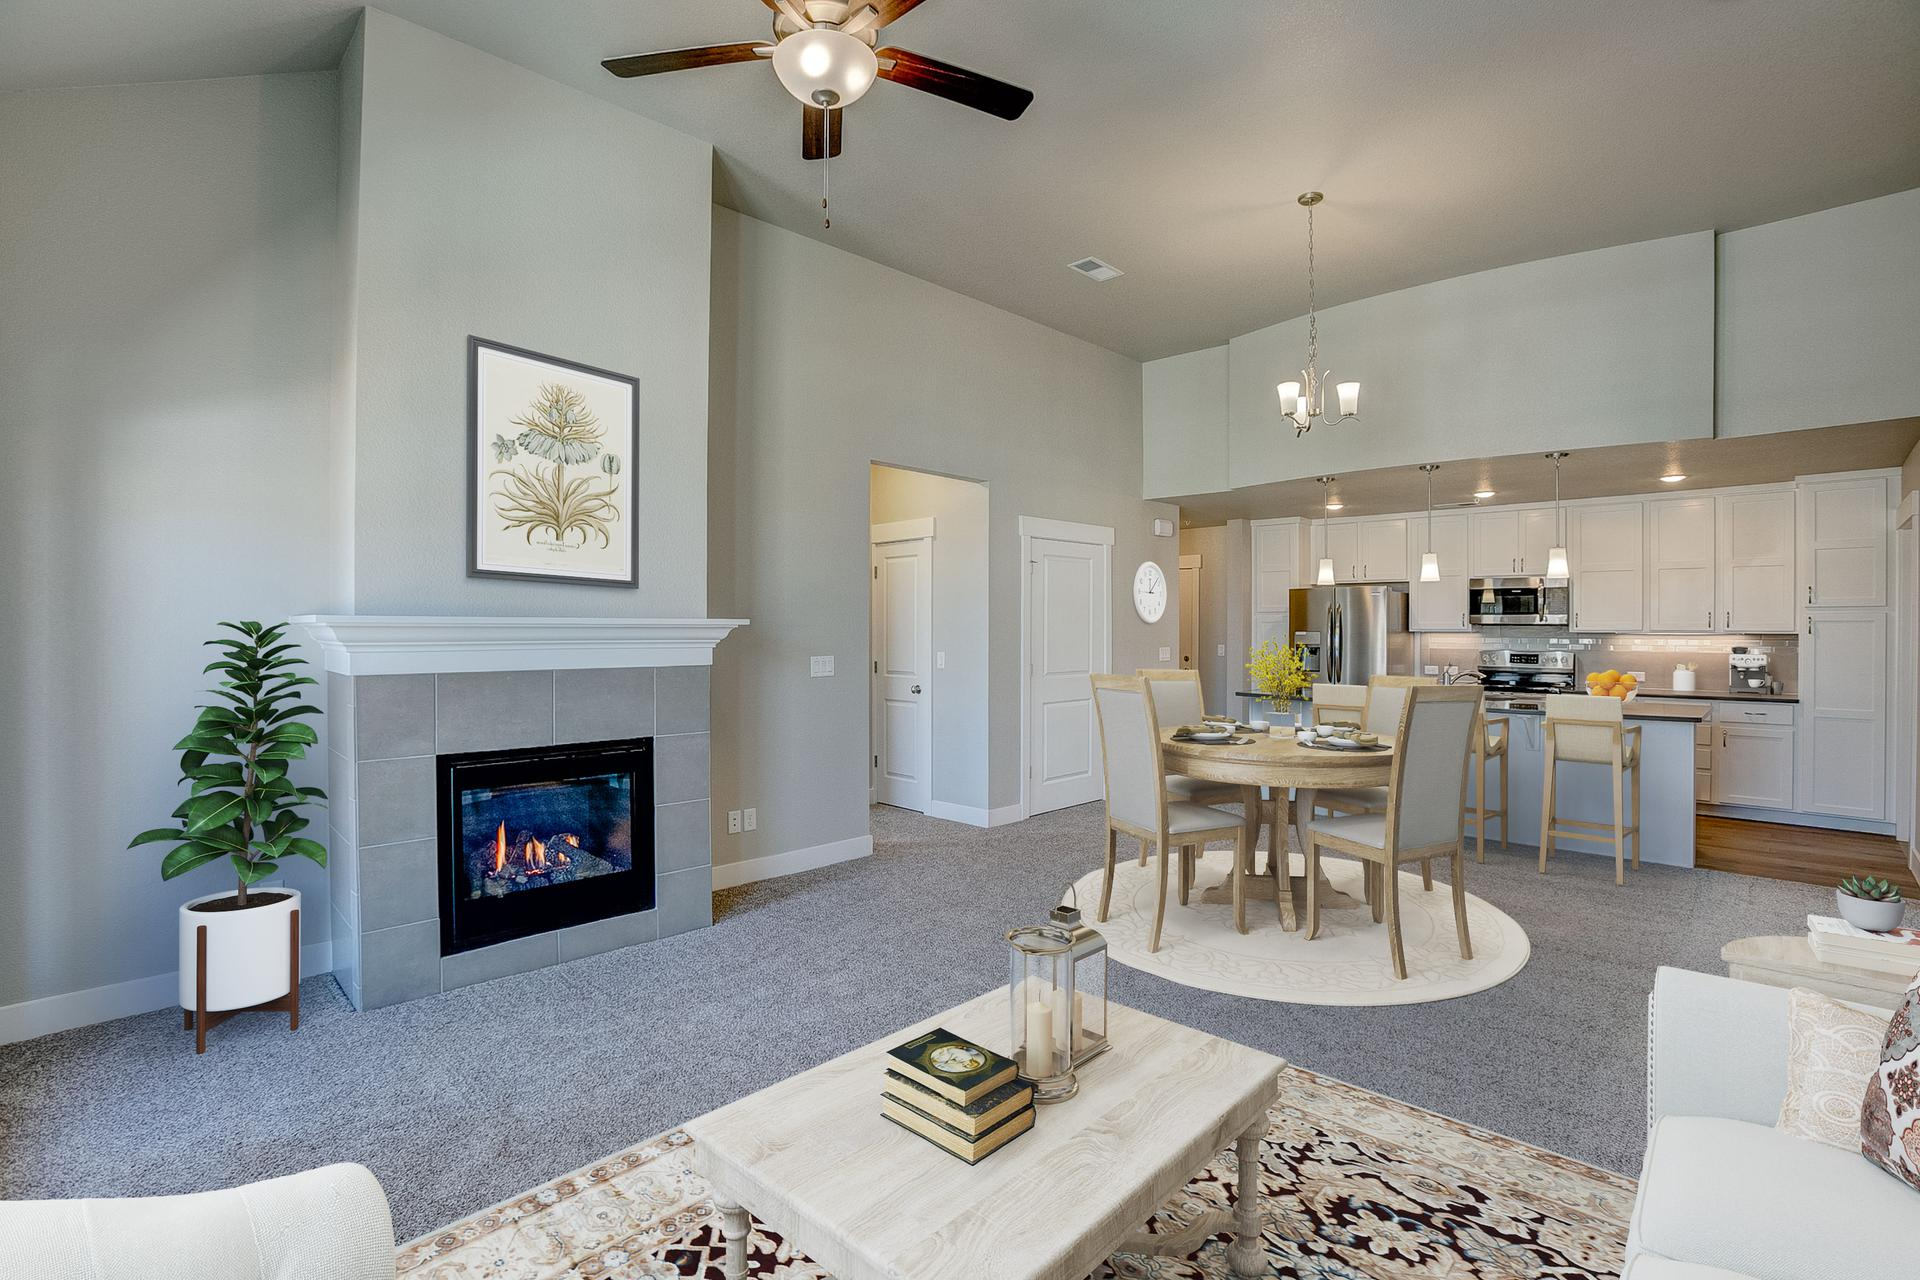 Living Room -  Previous Cambridge Floor Plan. Cambridge 2 New Home Floor Plan